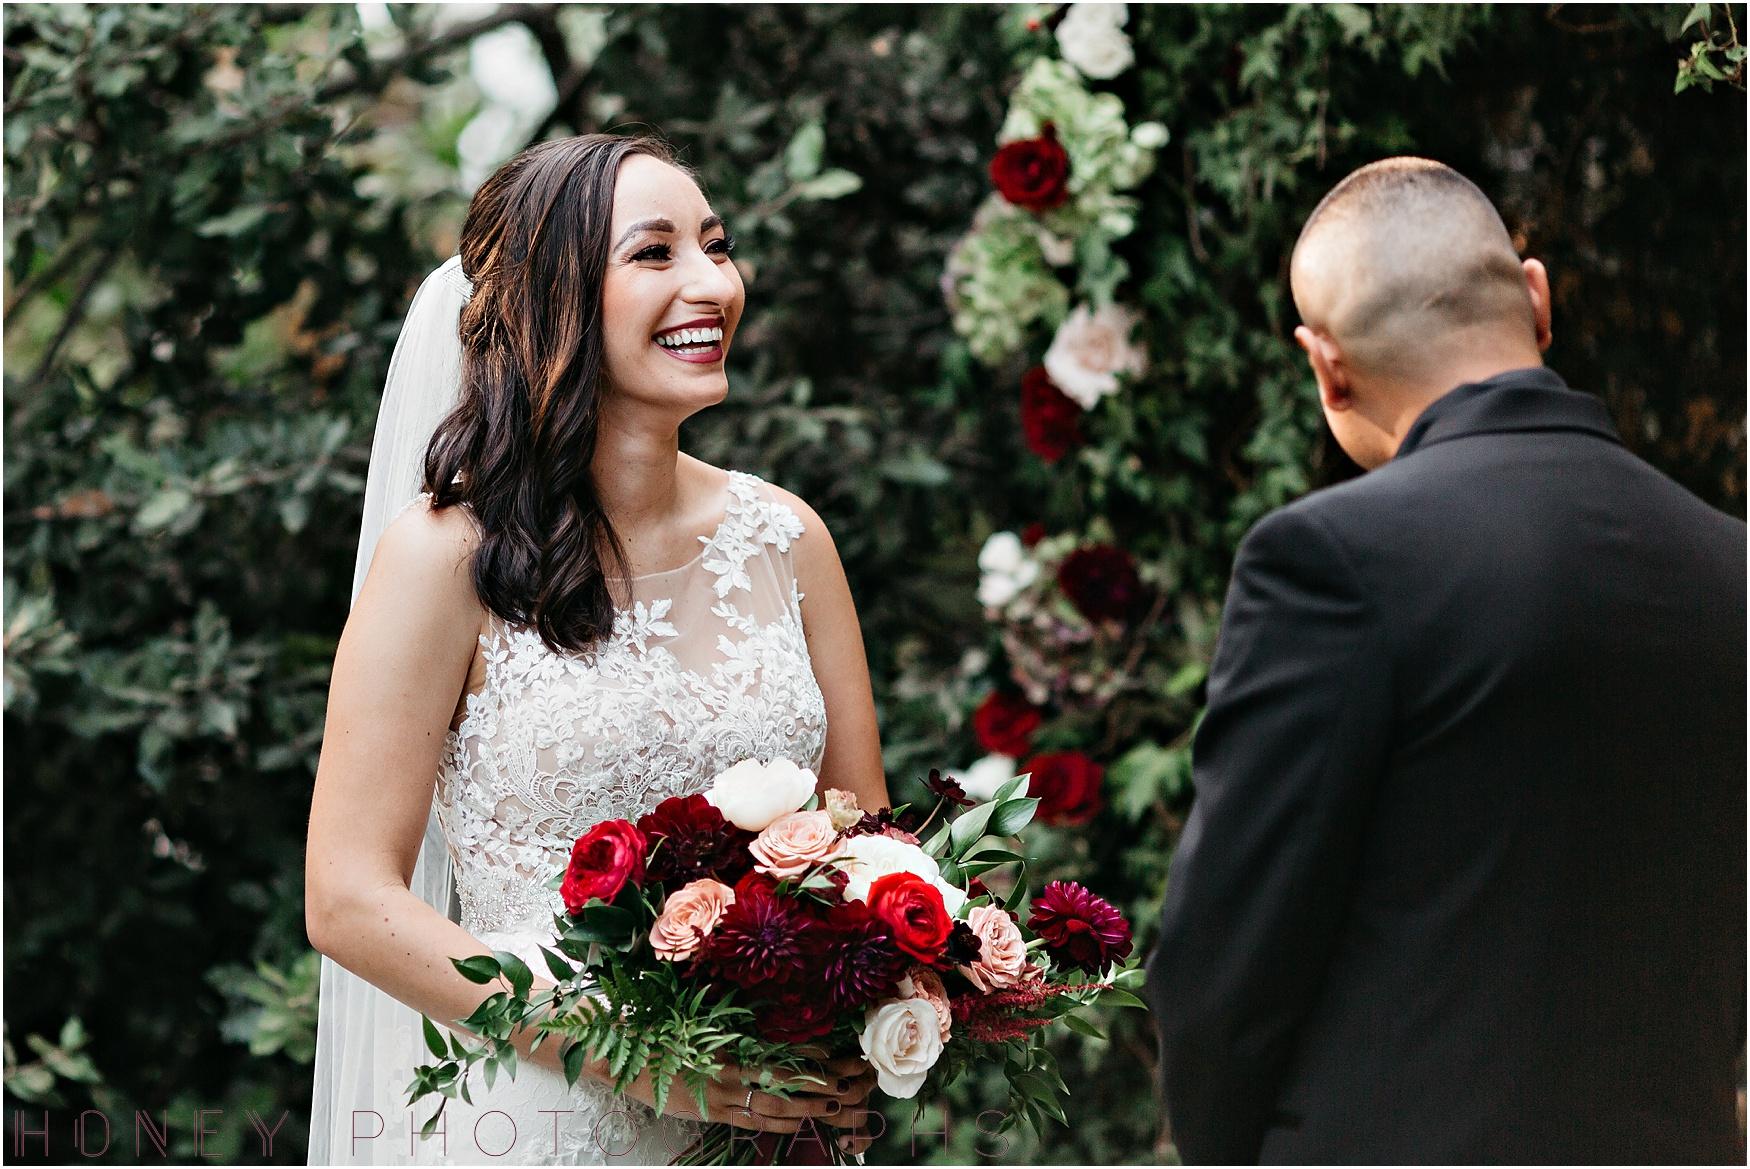 twin_oaks_garden_estate_fall_winter_burgundy_wedding022.jpg